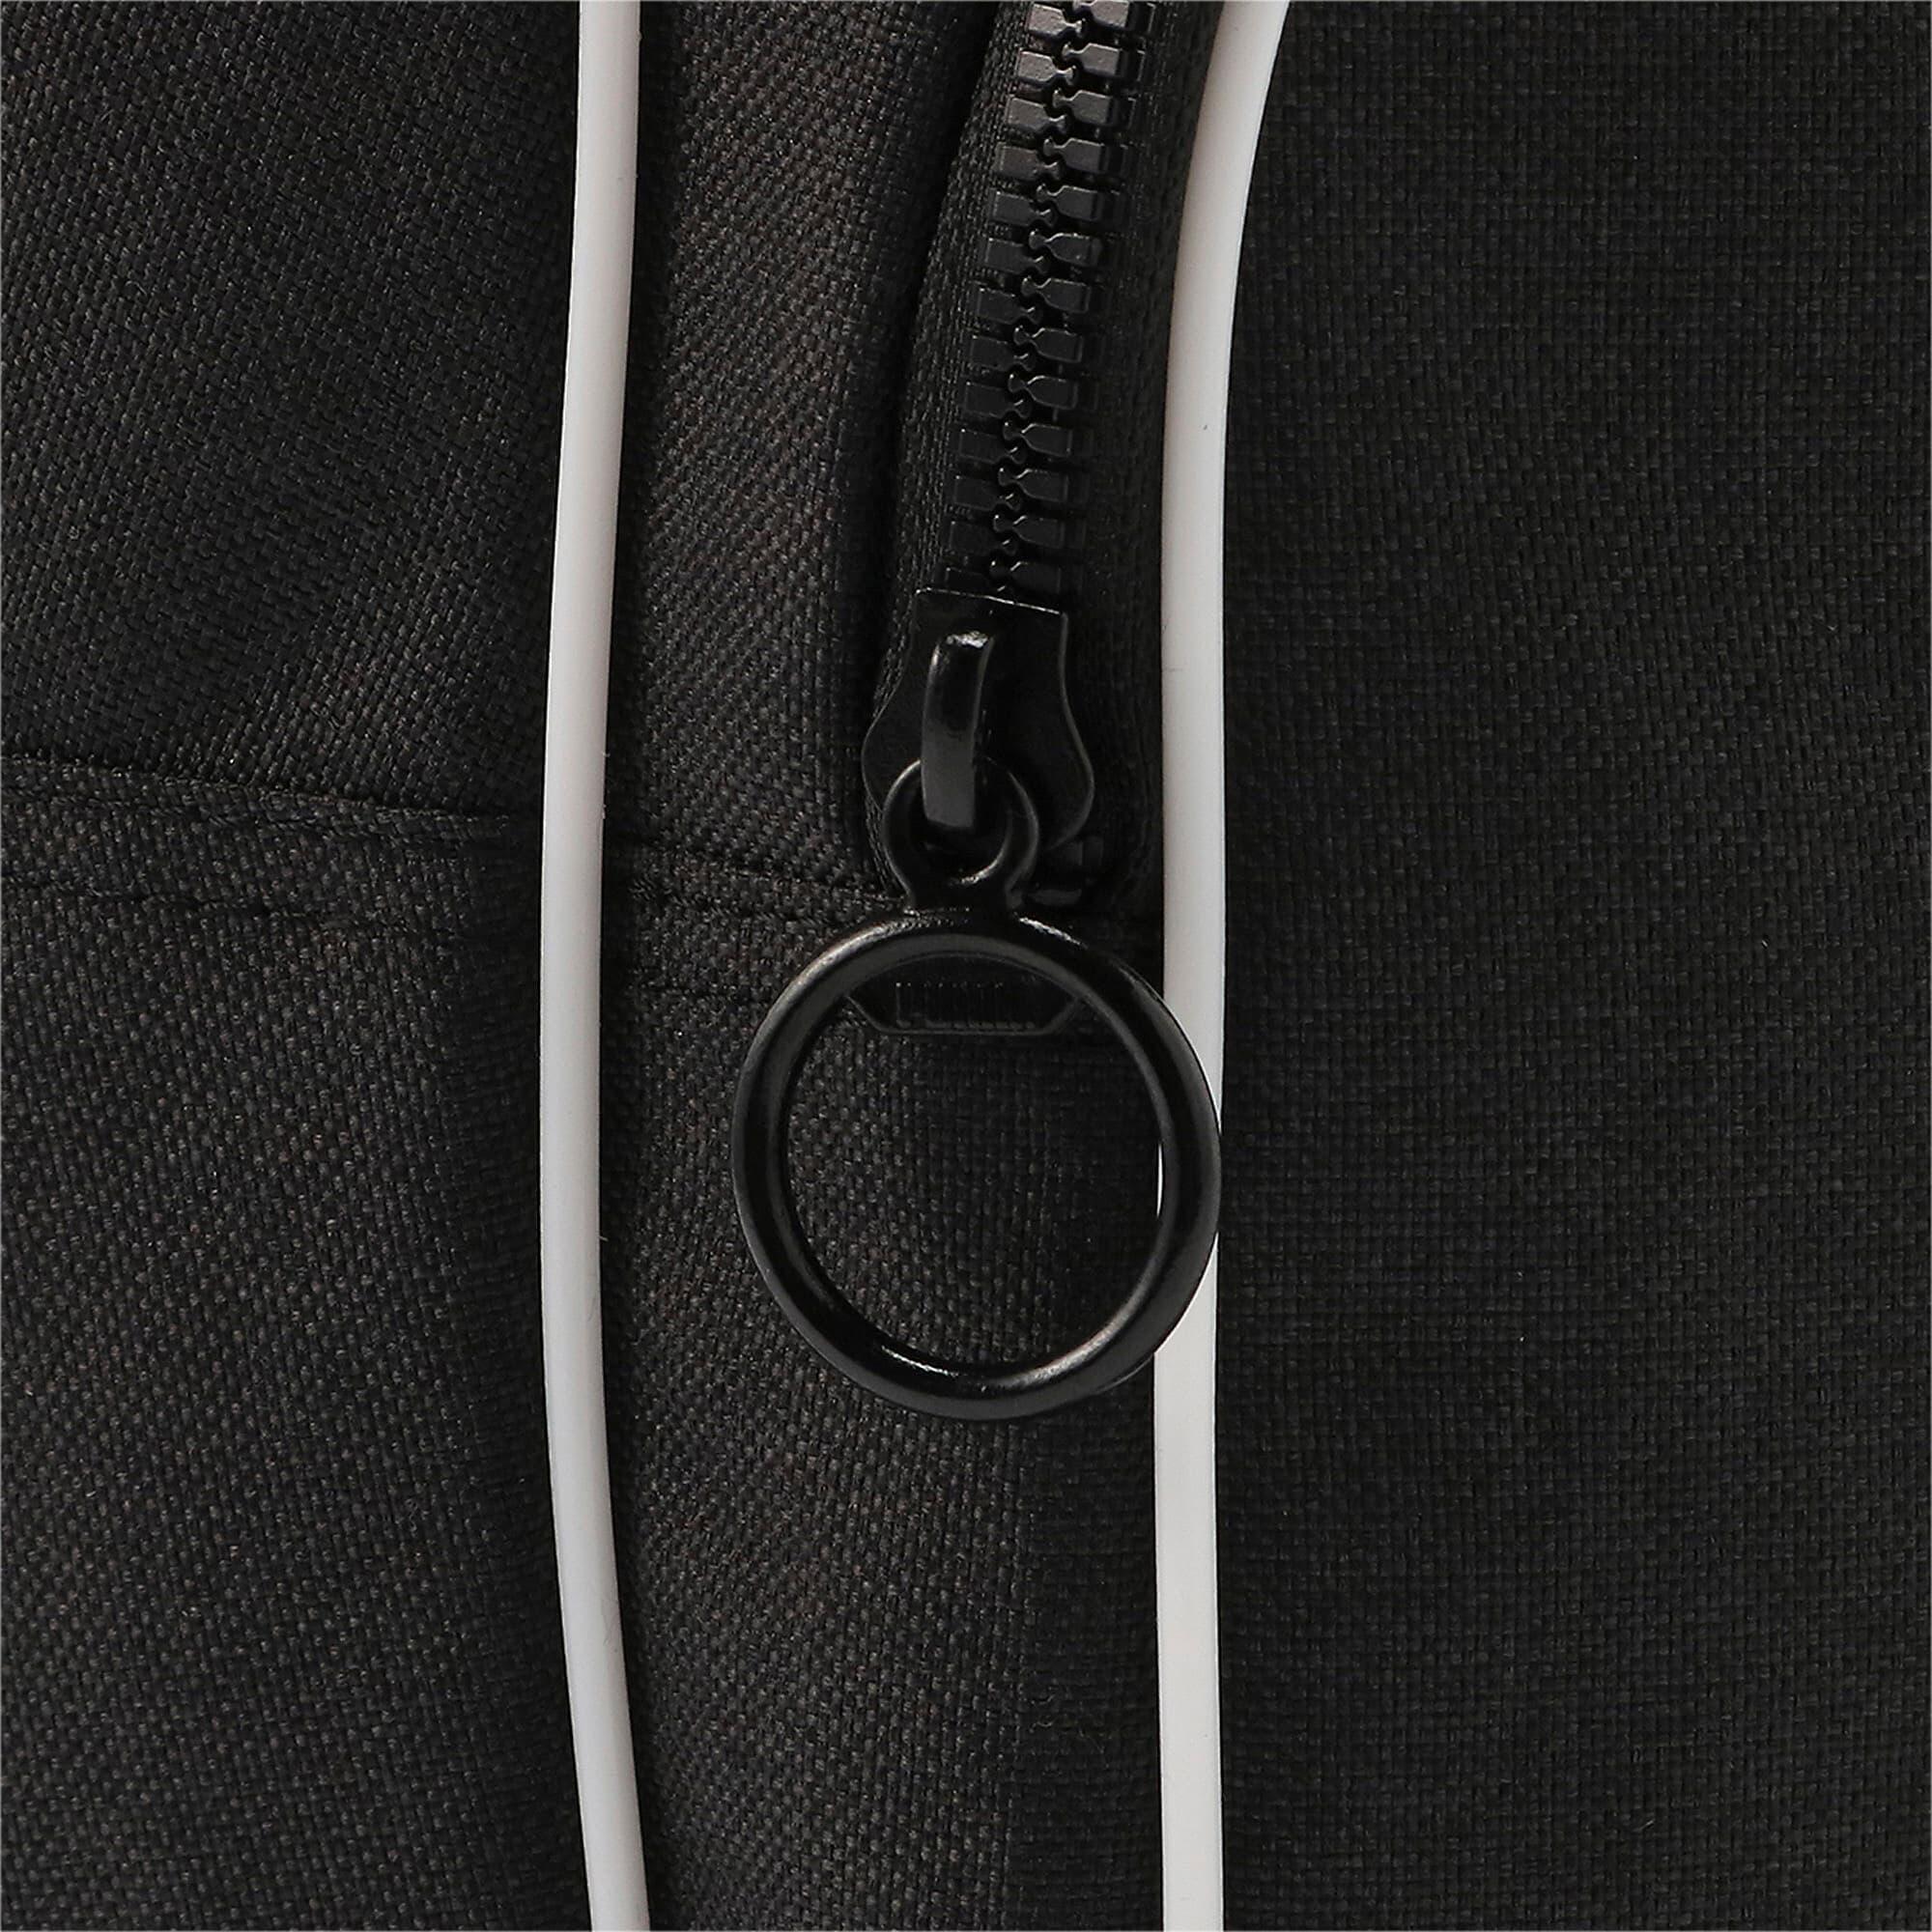 Thumbnail 7 of オリジナルス バックパック レトロ ウーブン 23L, Puma Black, medium-JPN